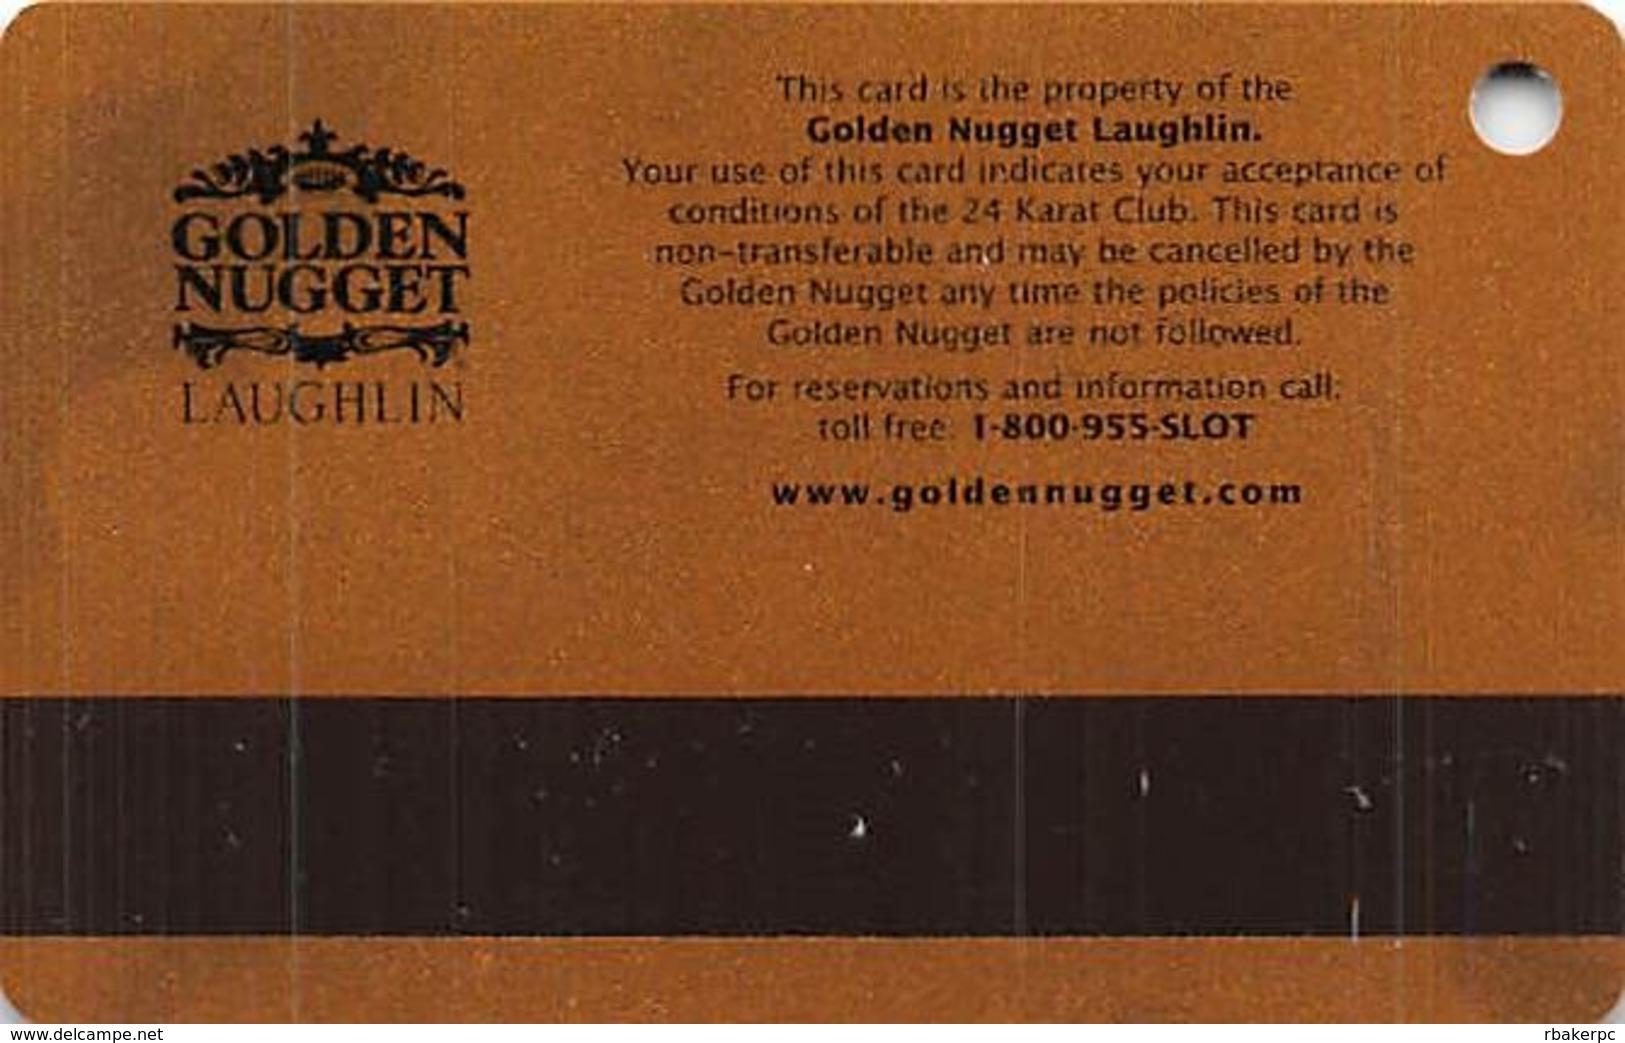 Golden Nugget Casino Laughlin, NV - Slot Card - No Manufacturer Mark - Casino Cards